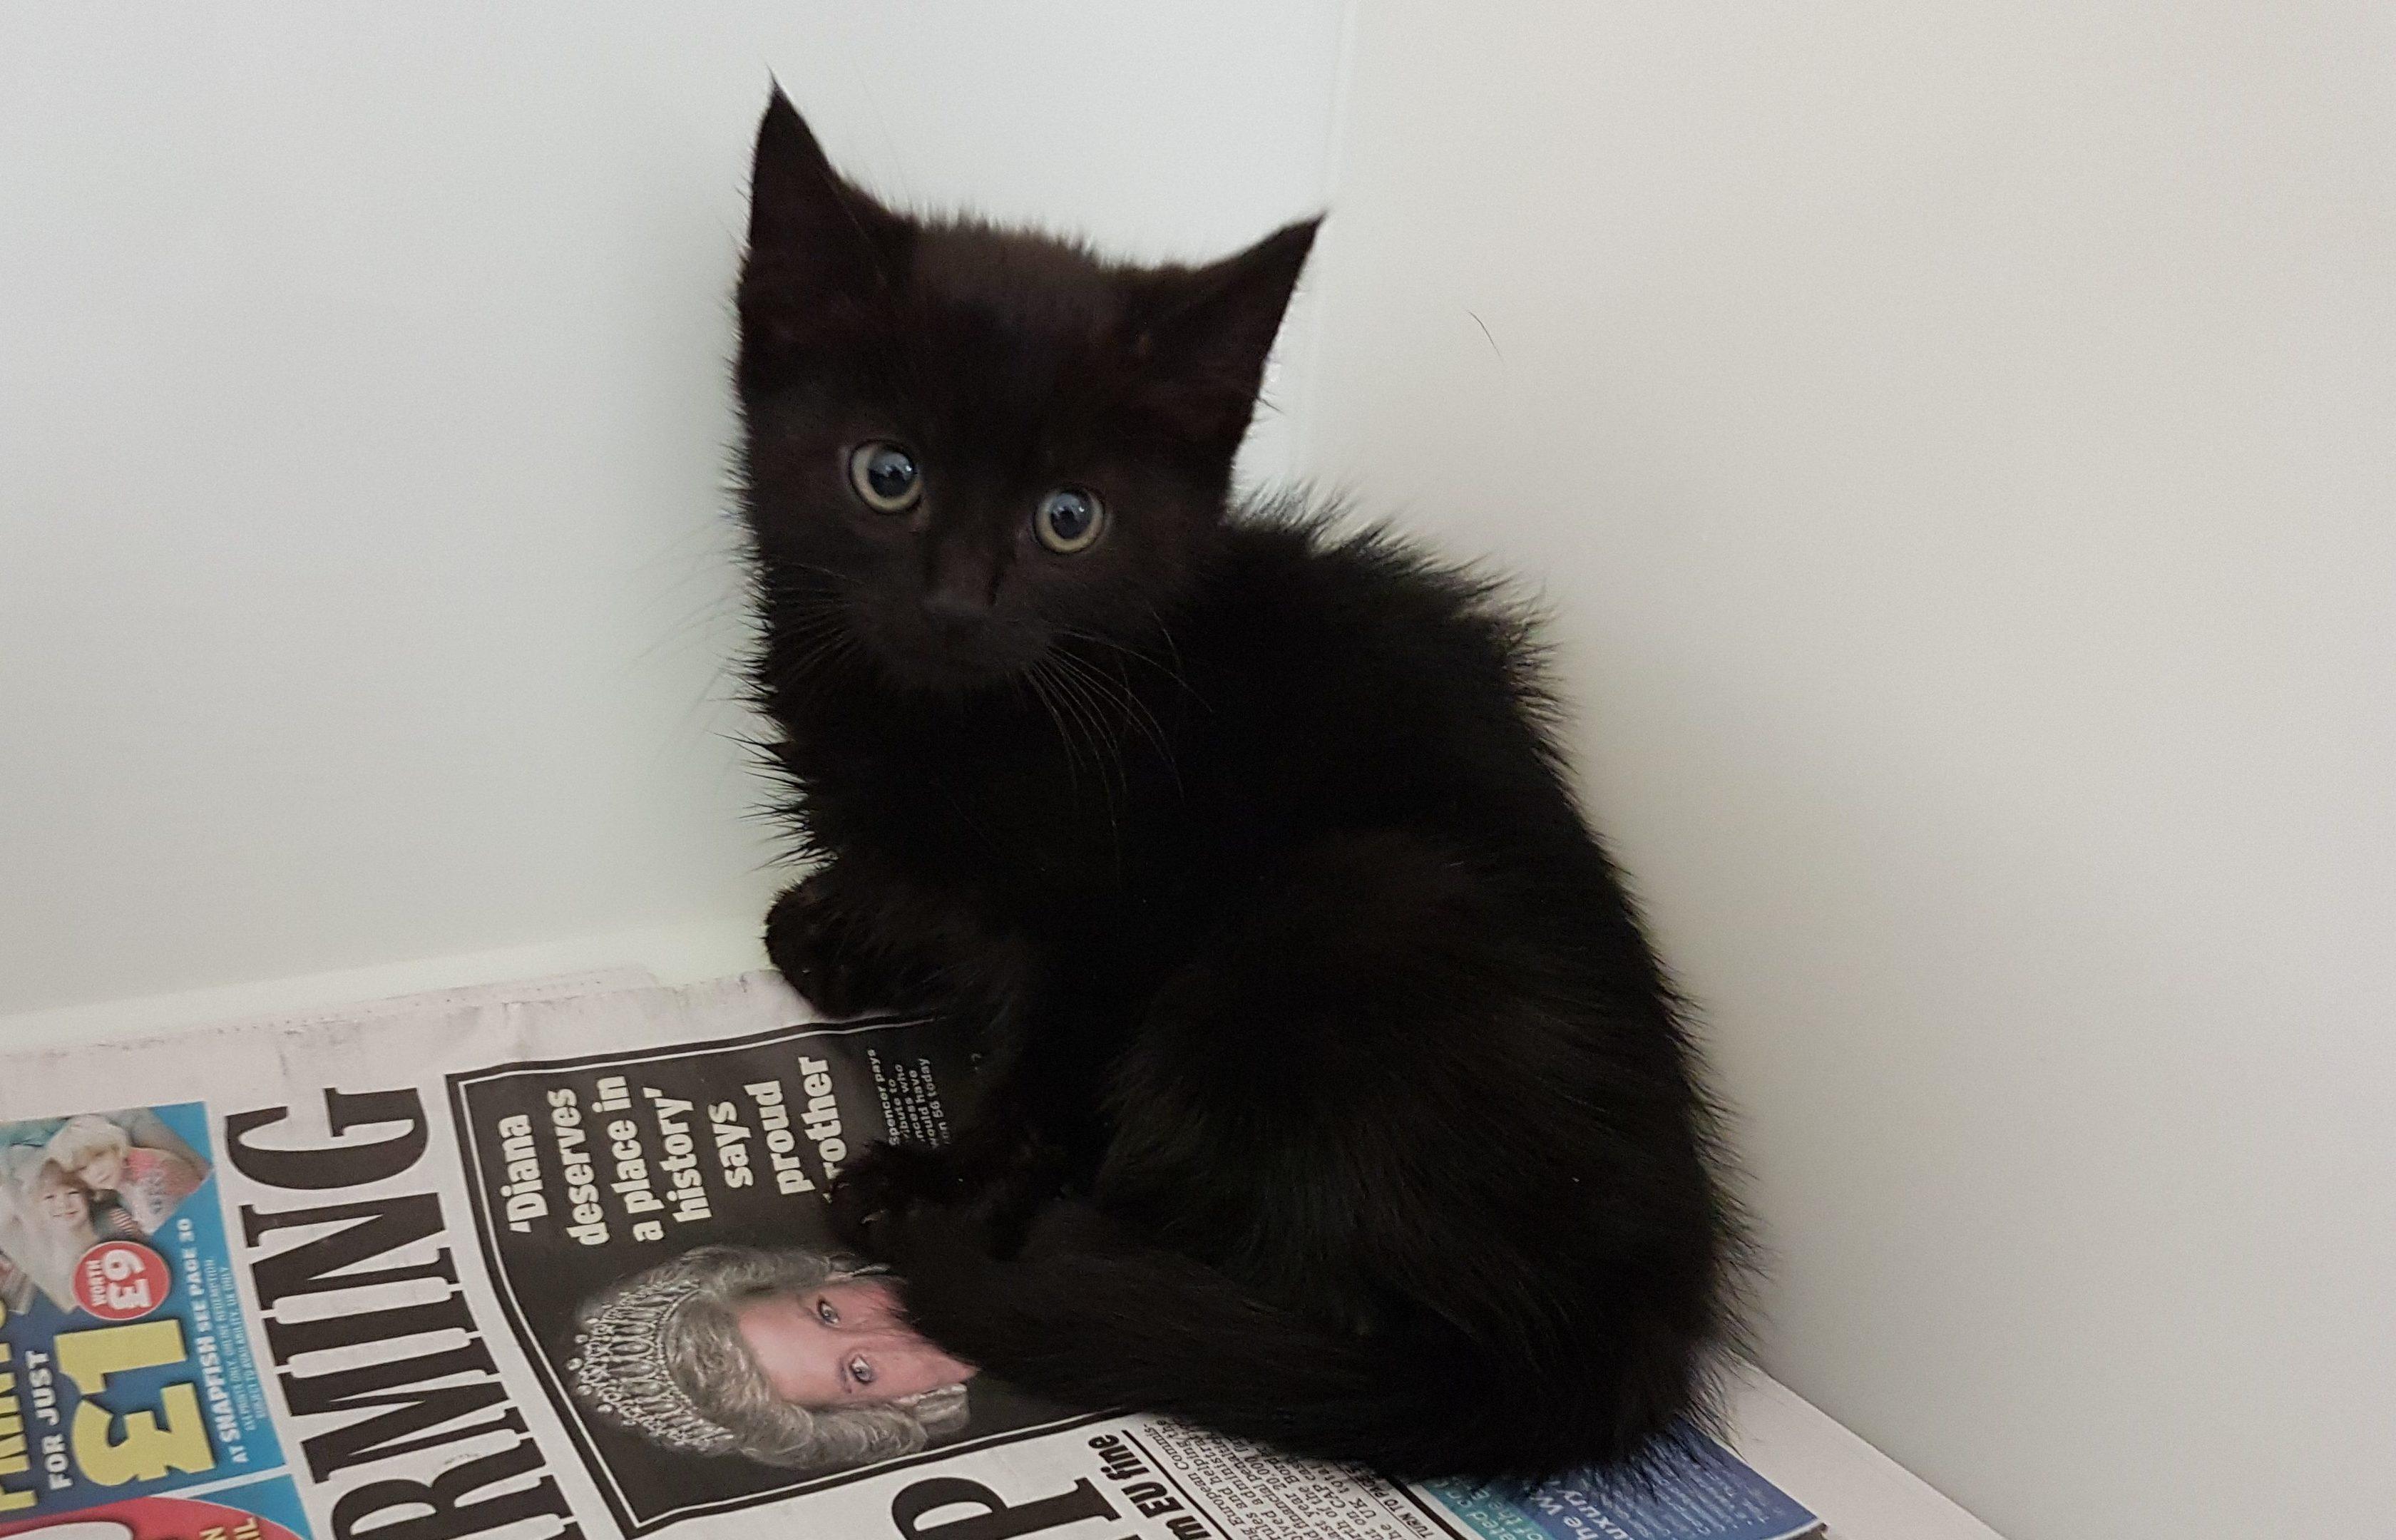 The kitten was found inside a bin near a restaurant.